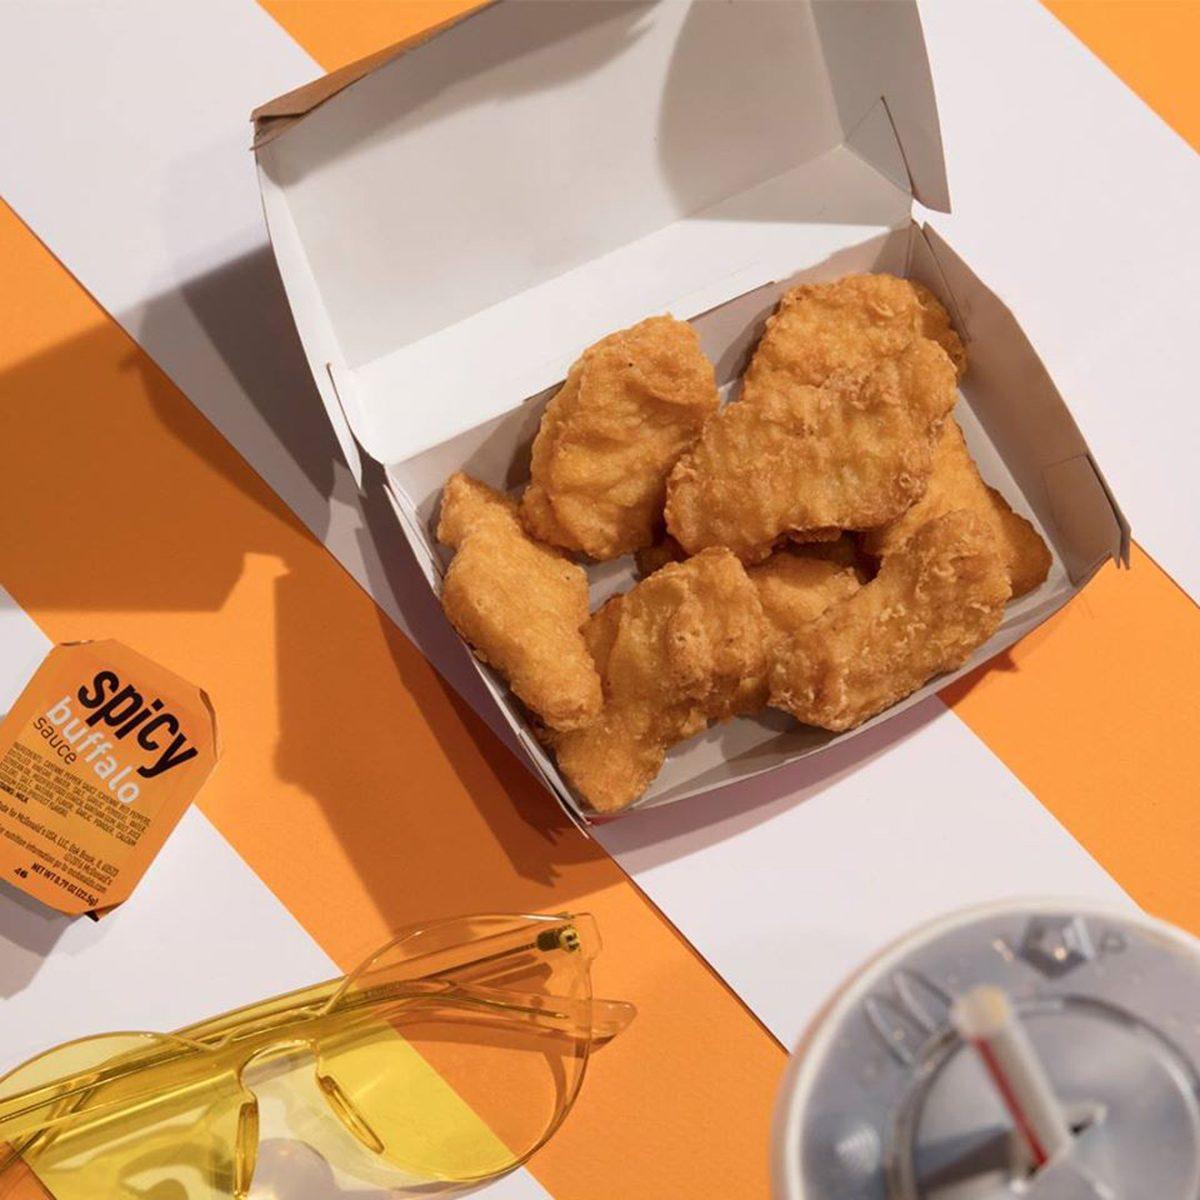 McDonald's chicken nuggets